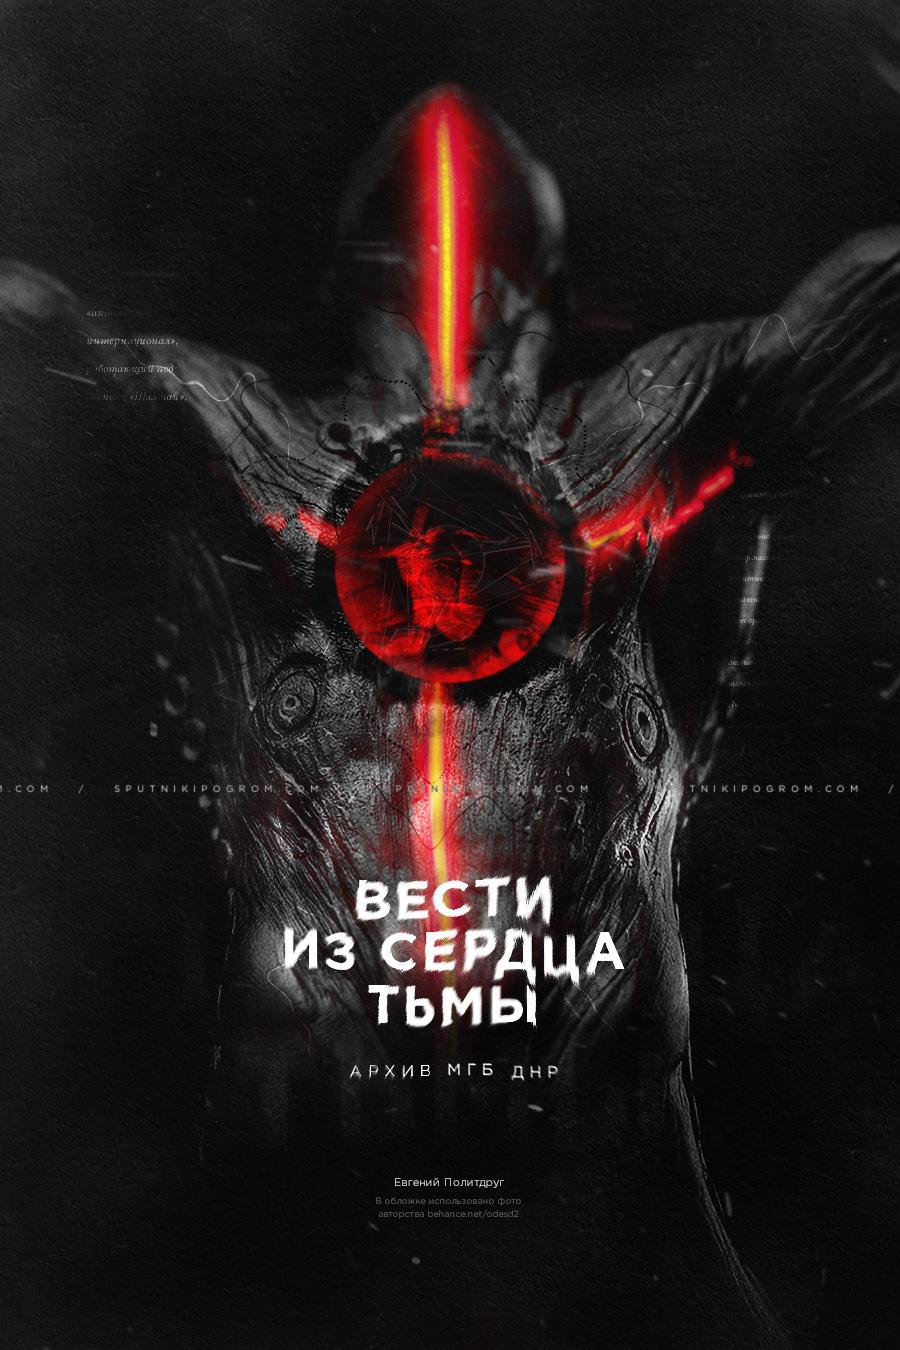 http://sputnikipogrom.com/wp-content/uploads/2015/09/heart-cover.jpg